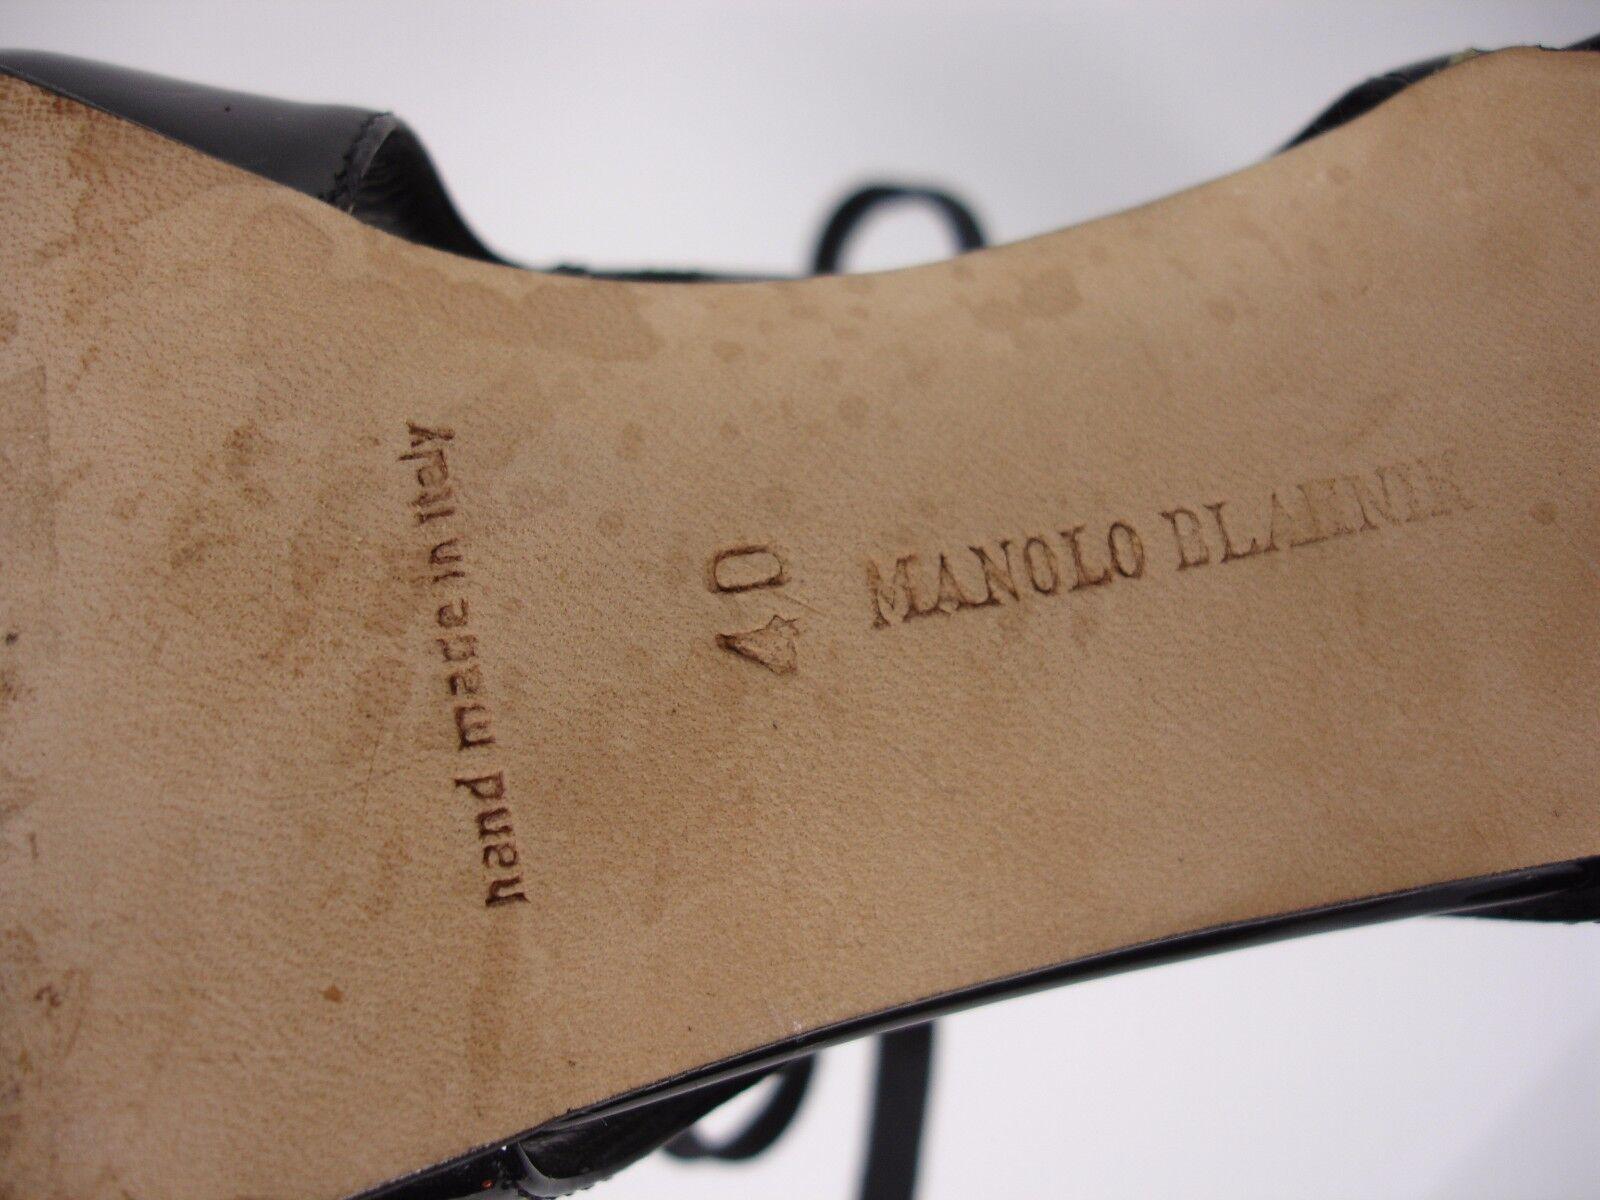 MANOLO BLAHNIK  PATENT LACE LEATHER LACE PATENT FRONT OPEN TOE HEELS Schuhe WOMEN'S 40 2039f3